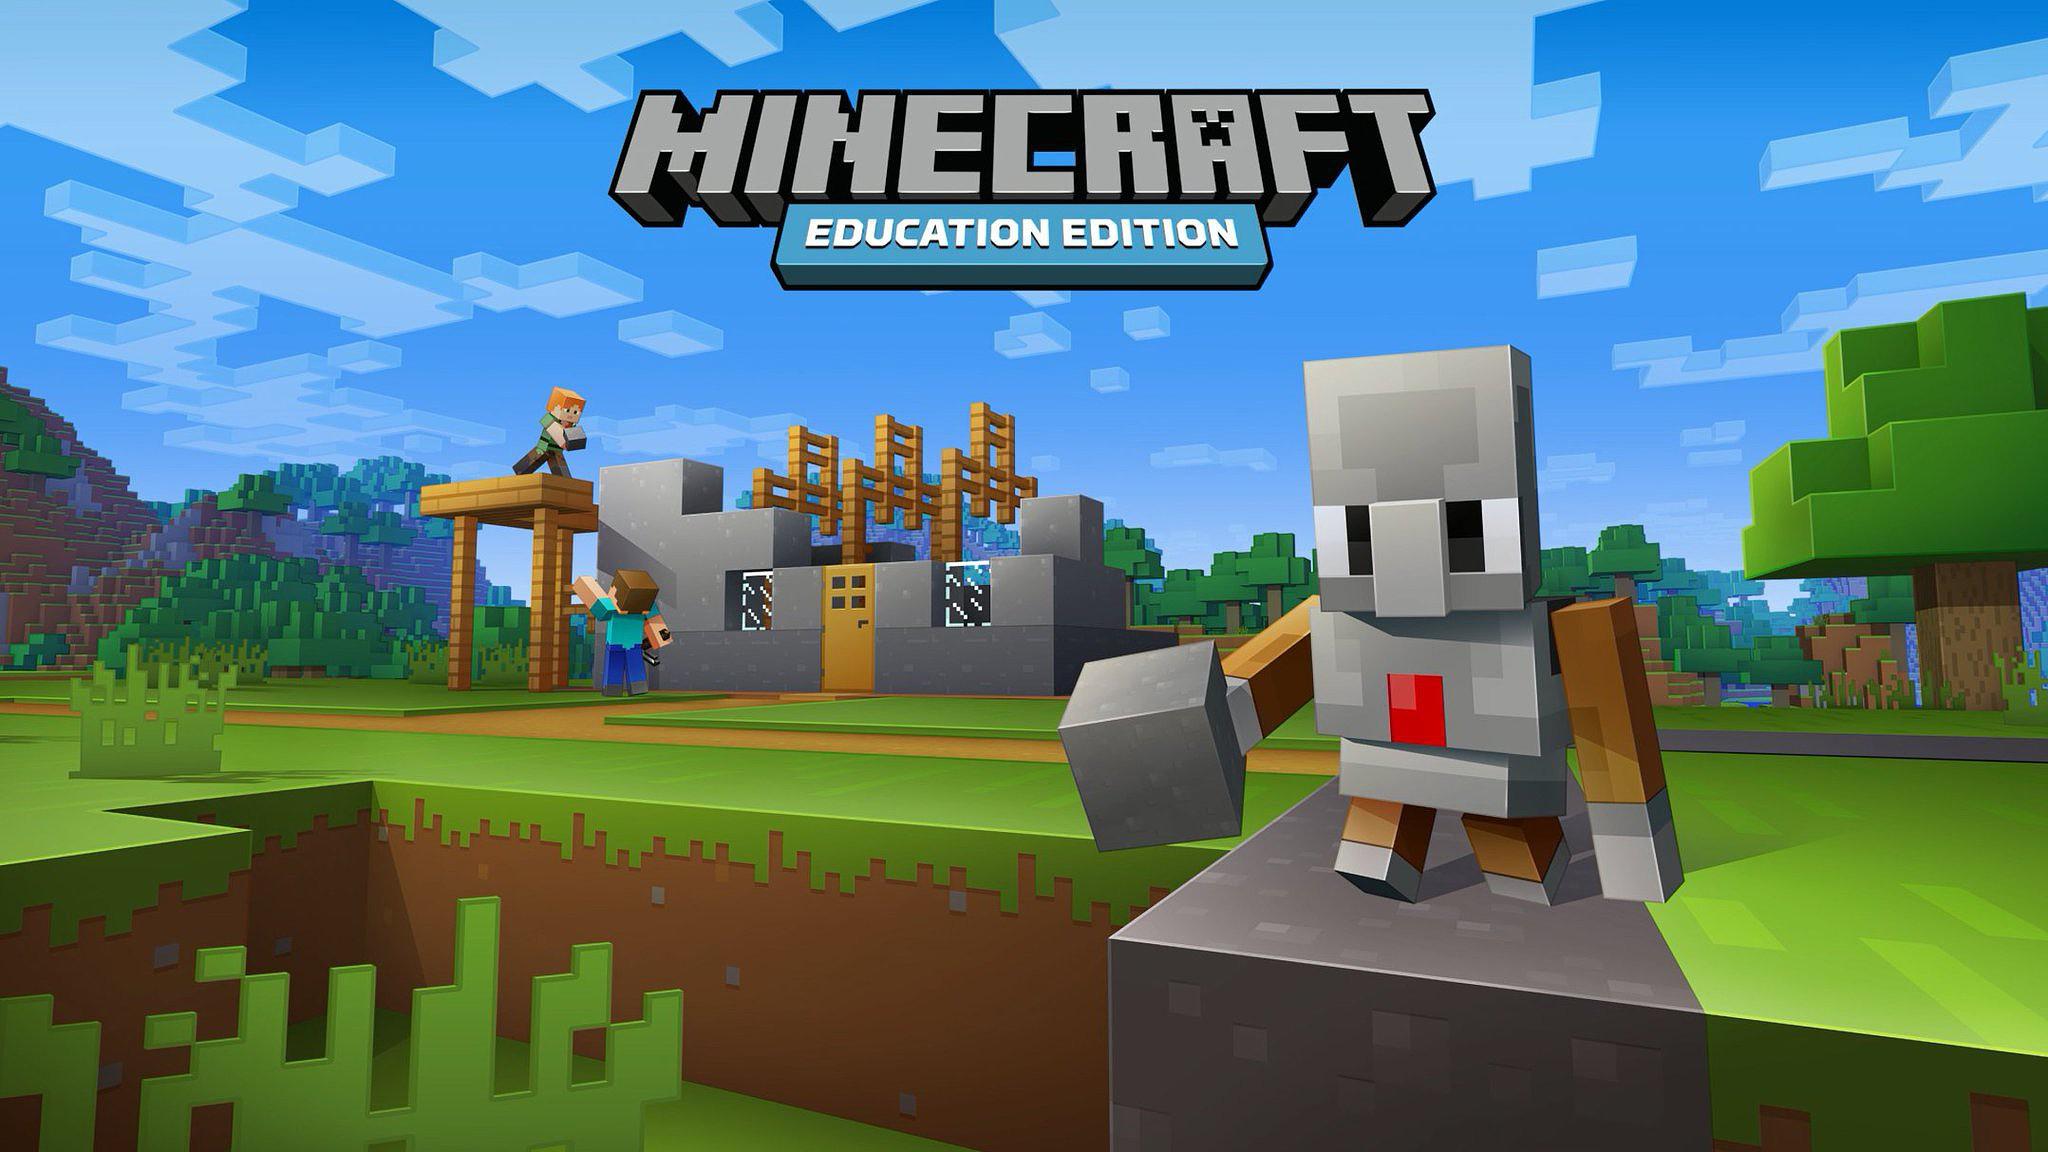 Escola virtual do Minecraft Education Edition abre as portas às